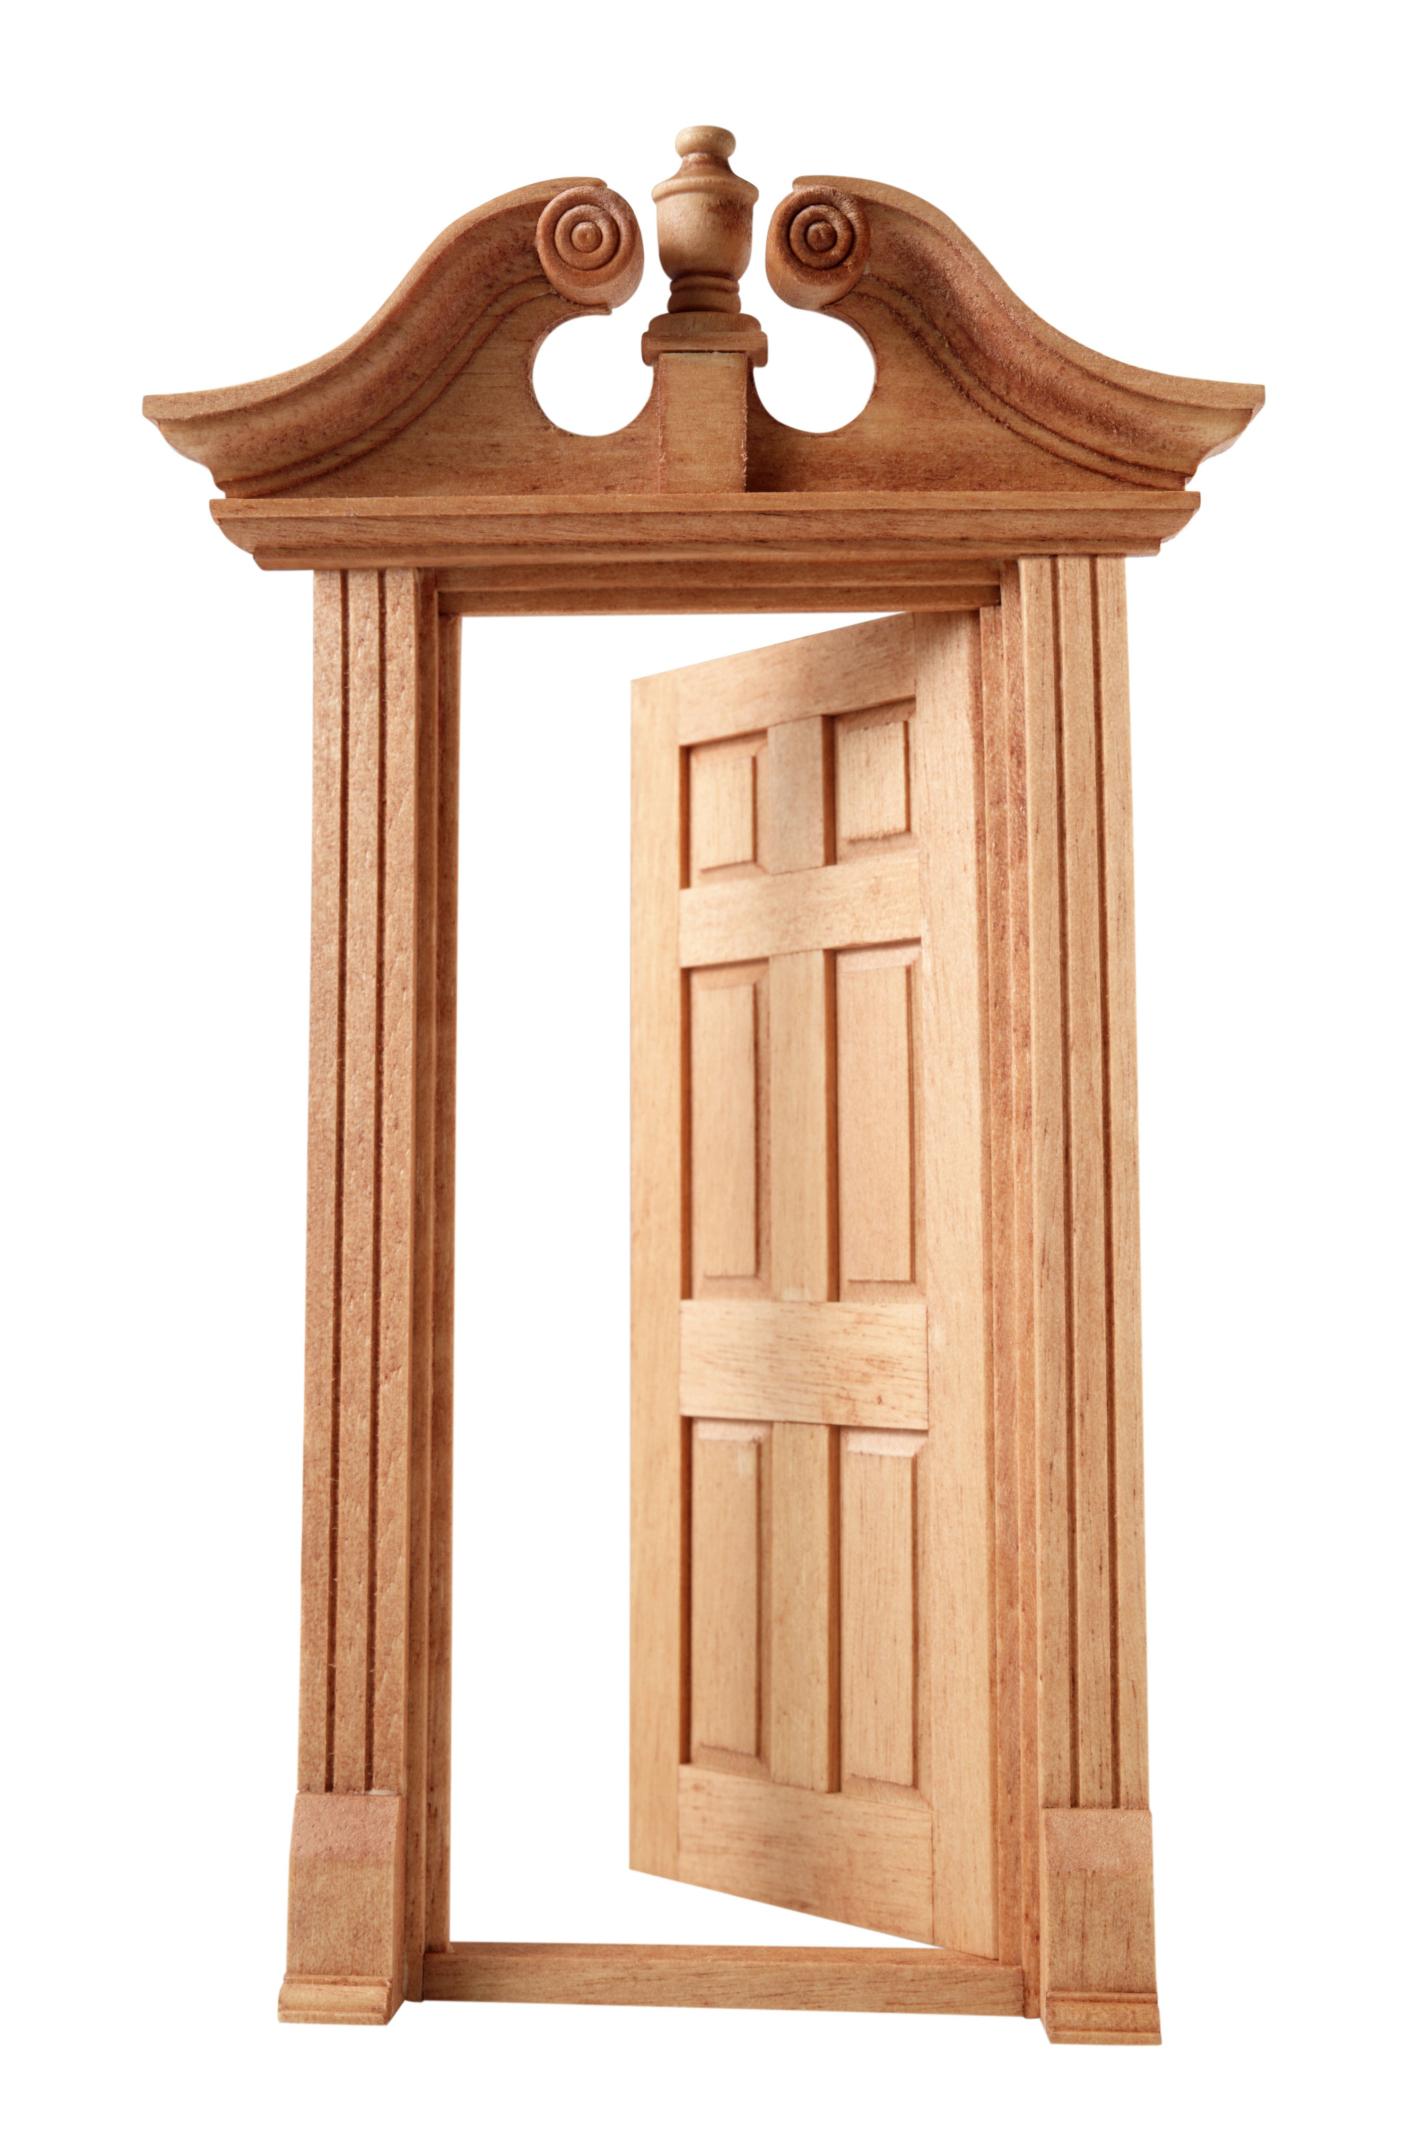 Partes del marco de una puerta |